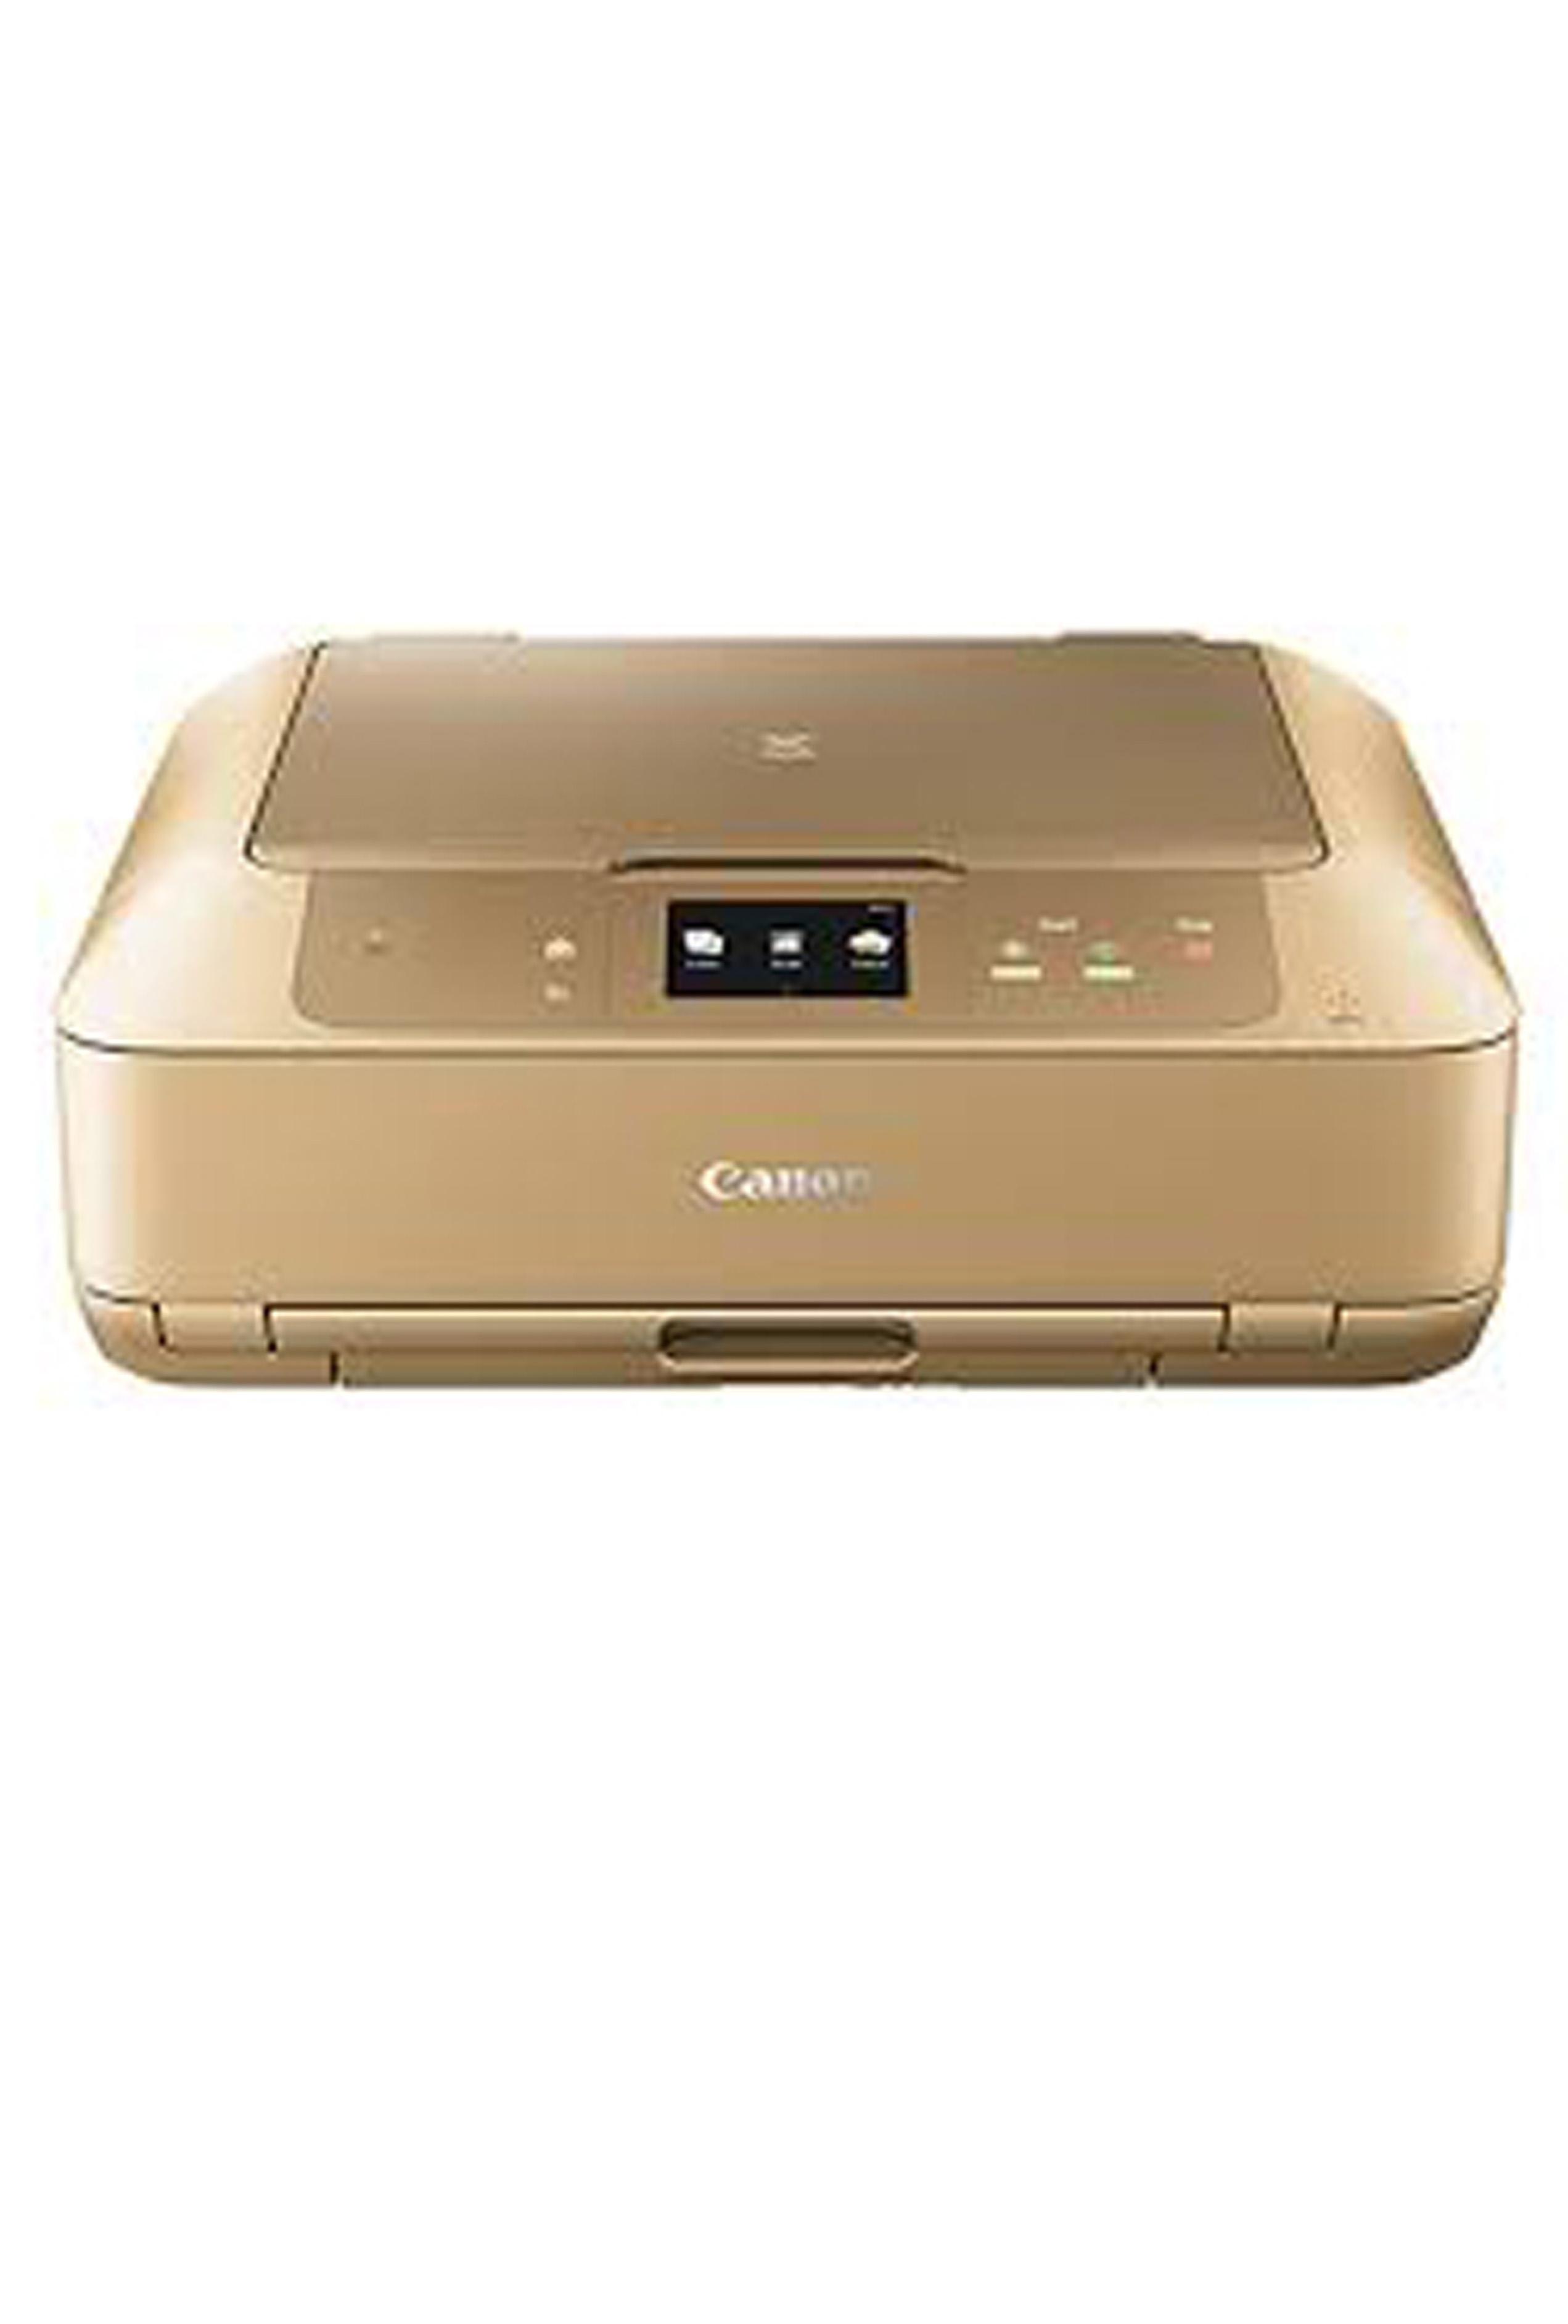 Canon PIXMA MG7720 Gold (15ipm/10ipm)